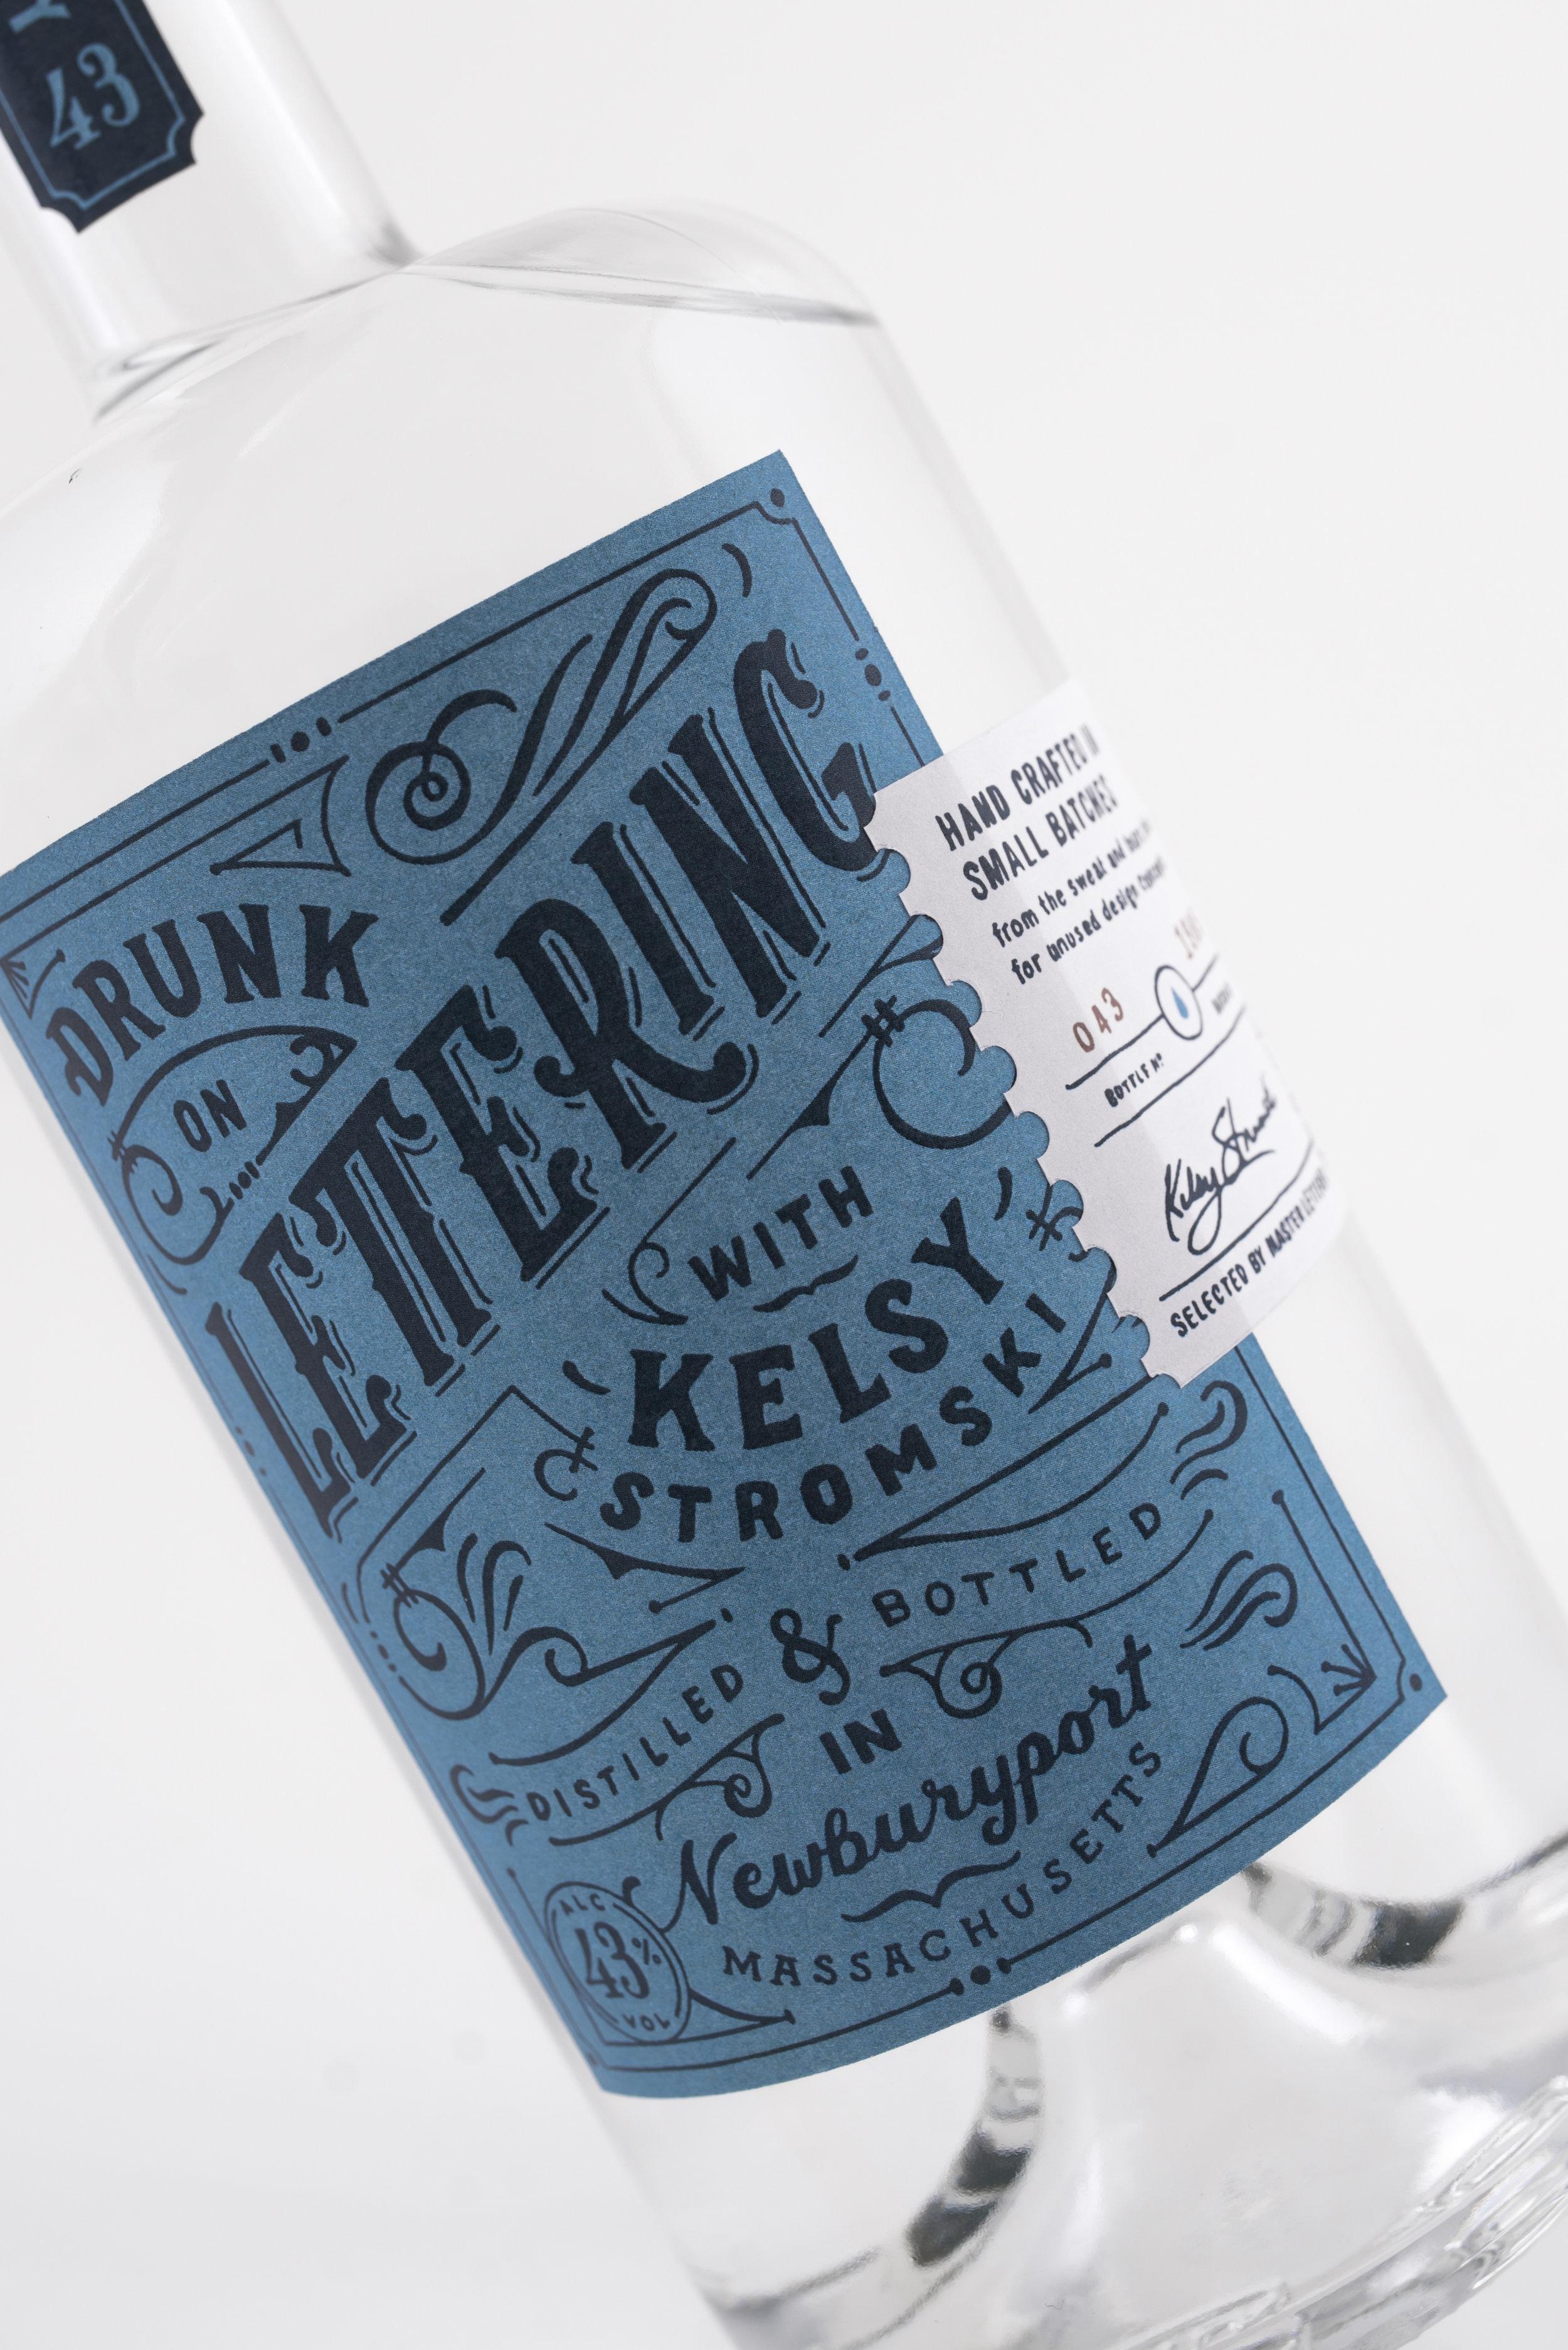 Self Published Hand-lettered Label Designed to Promote Lettering Podcast